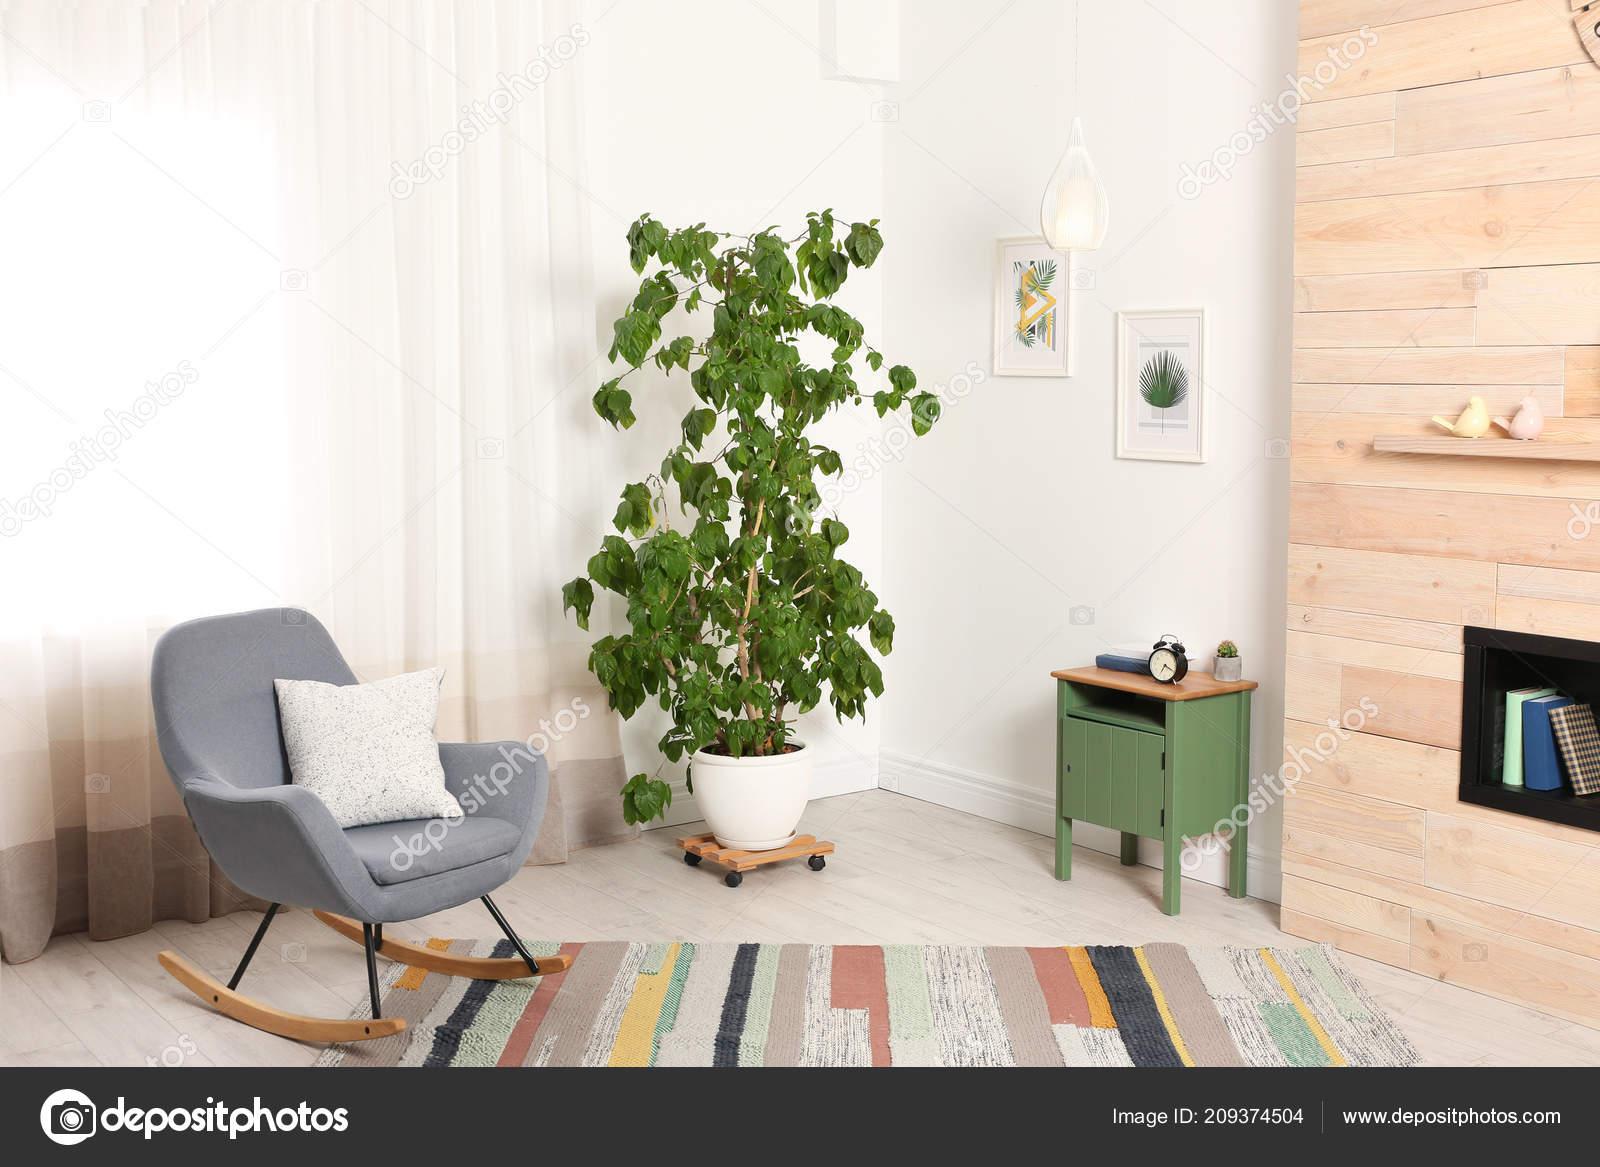 Stijlvolle kamer interieur met grote kamerplant schommelstoel